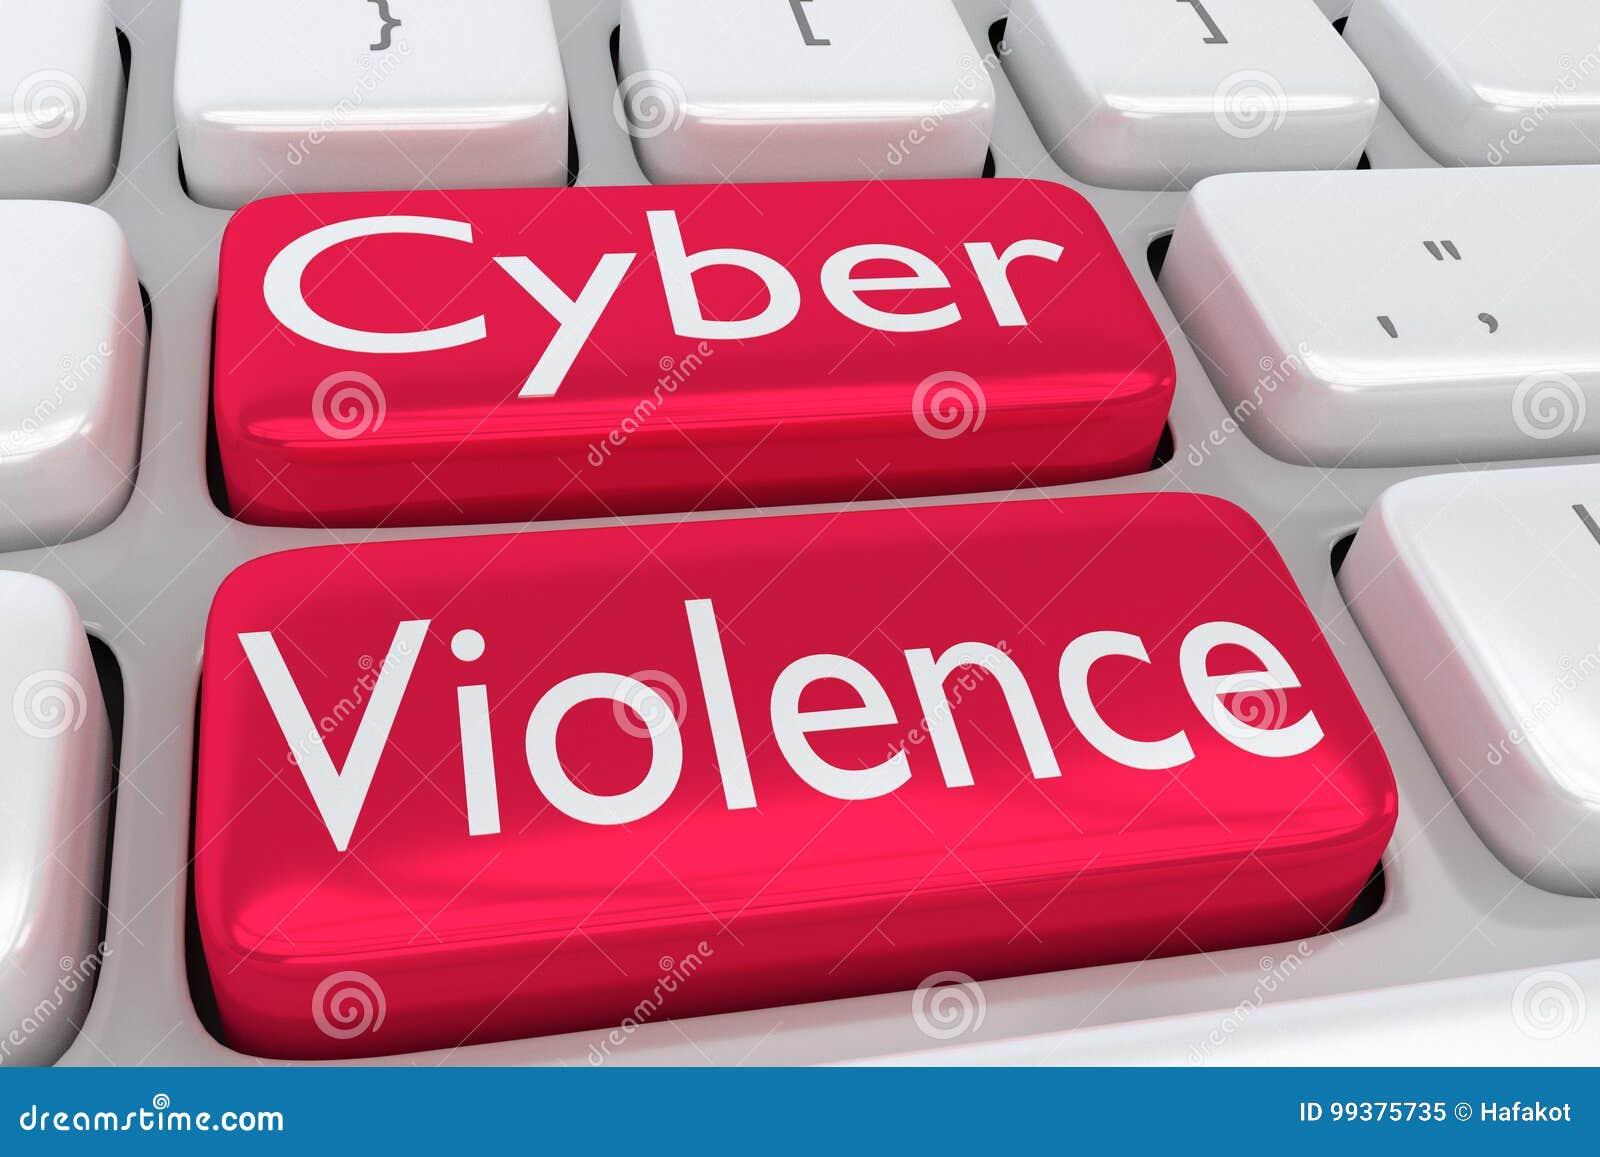 cyber violence_Cyber Violence concept stock illustration. Illustration of crisis - 99375735